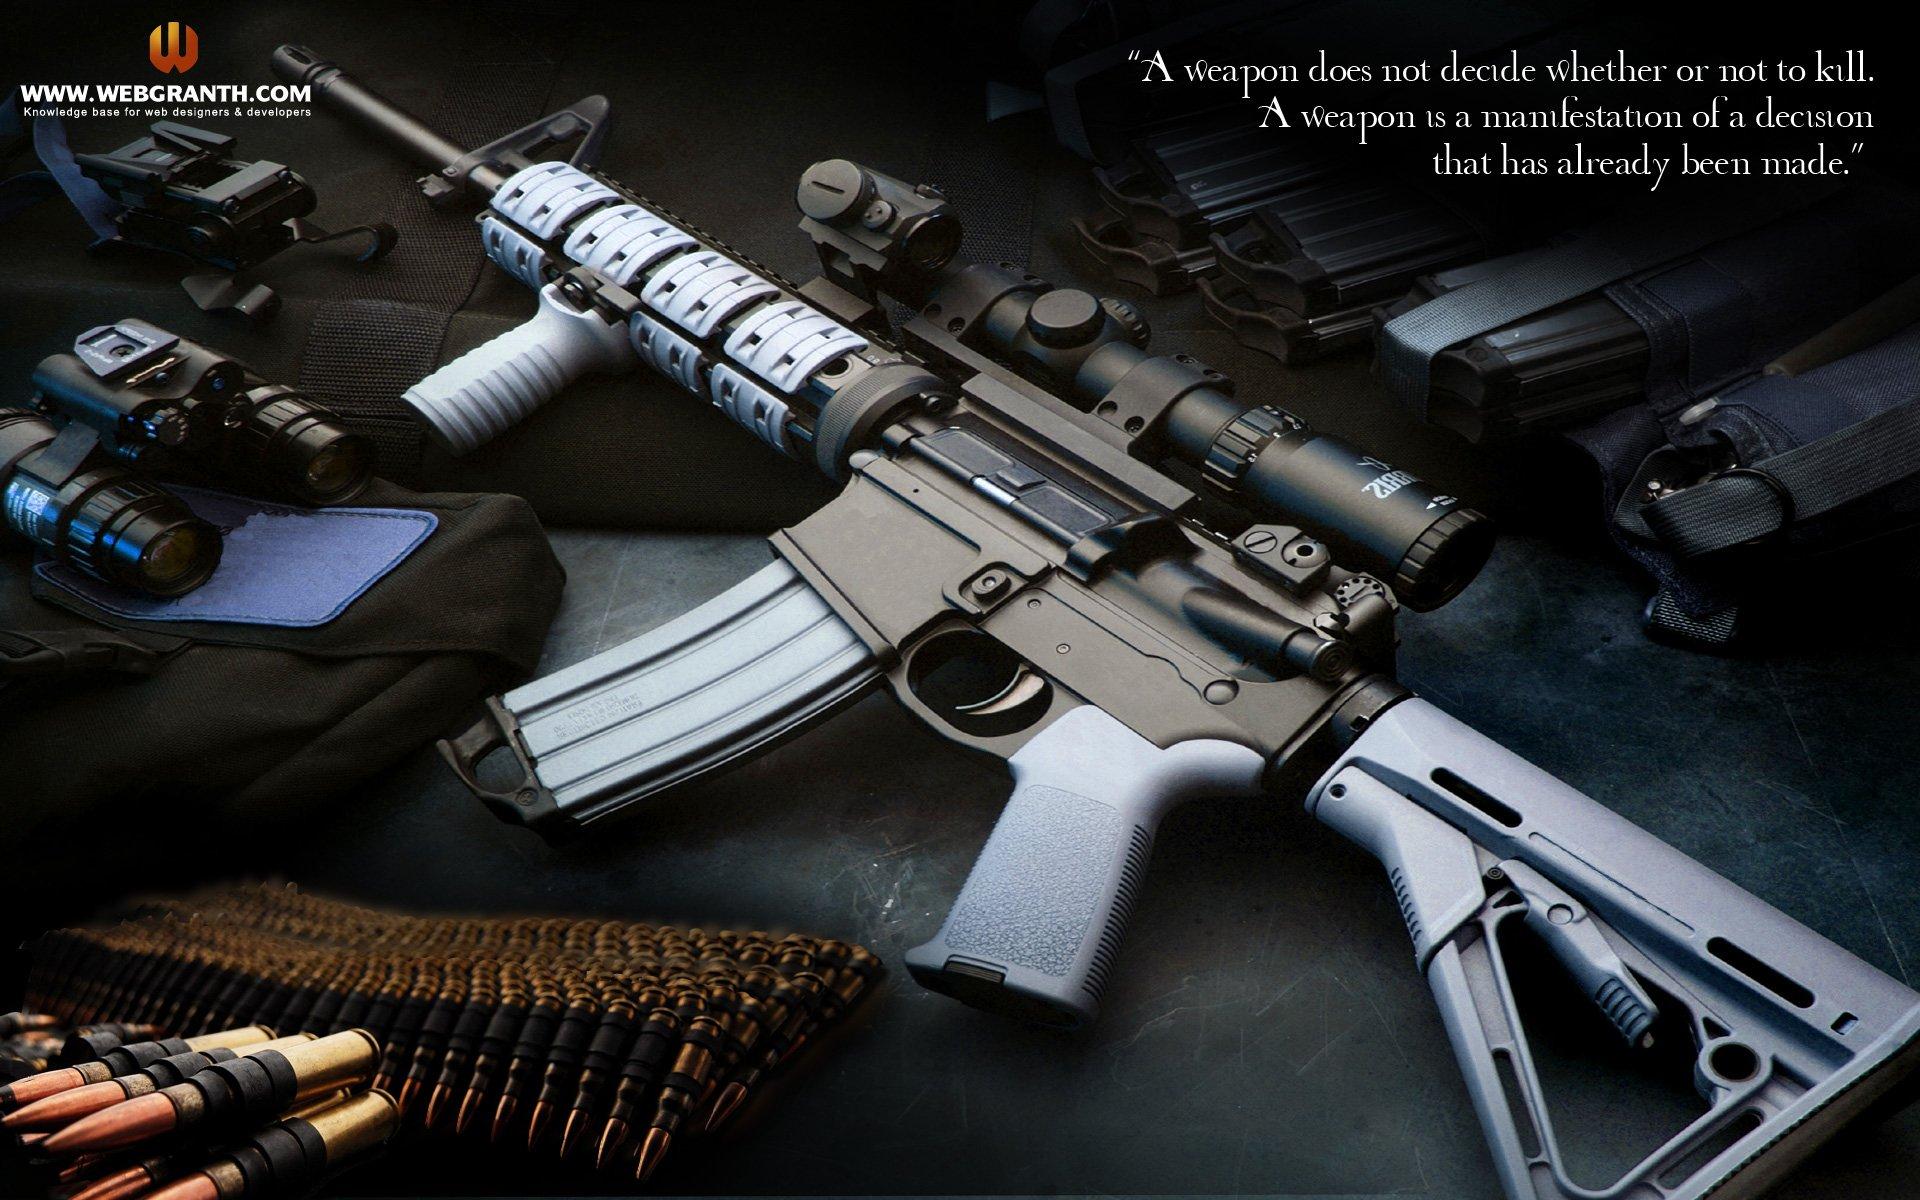 HD Guns Wallpaper Download HD Guns Weapons Wallpapers   Webgranth 1920x1200